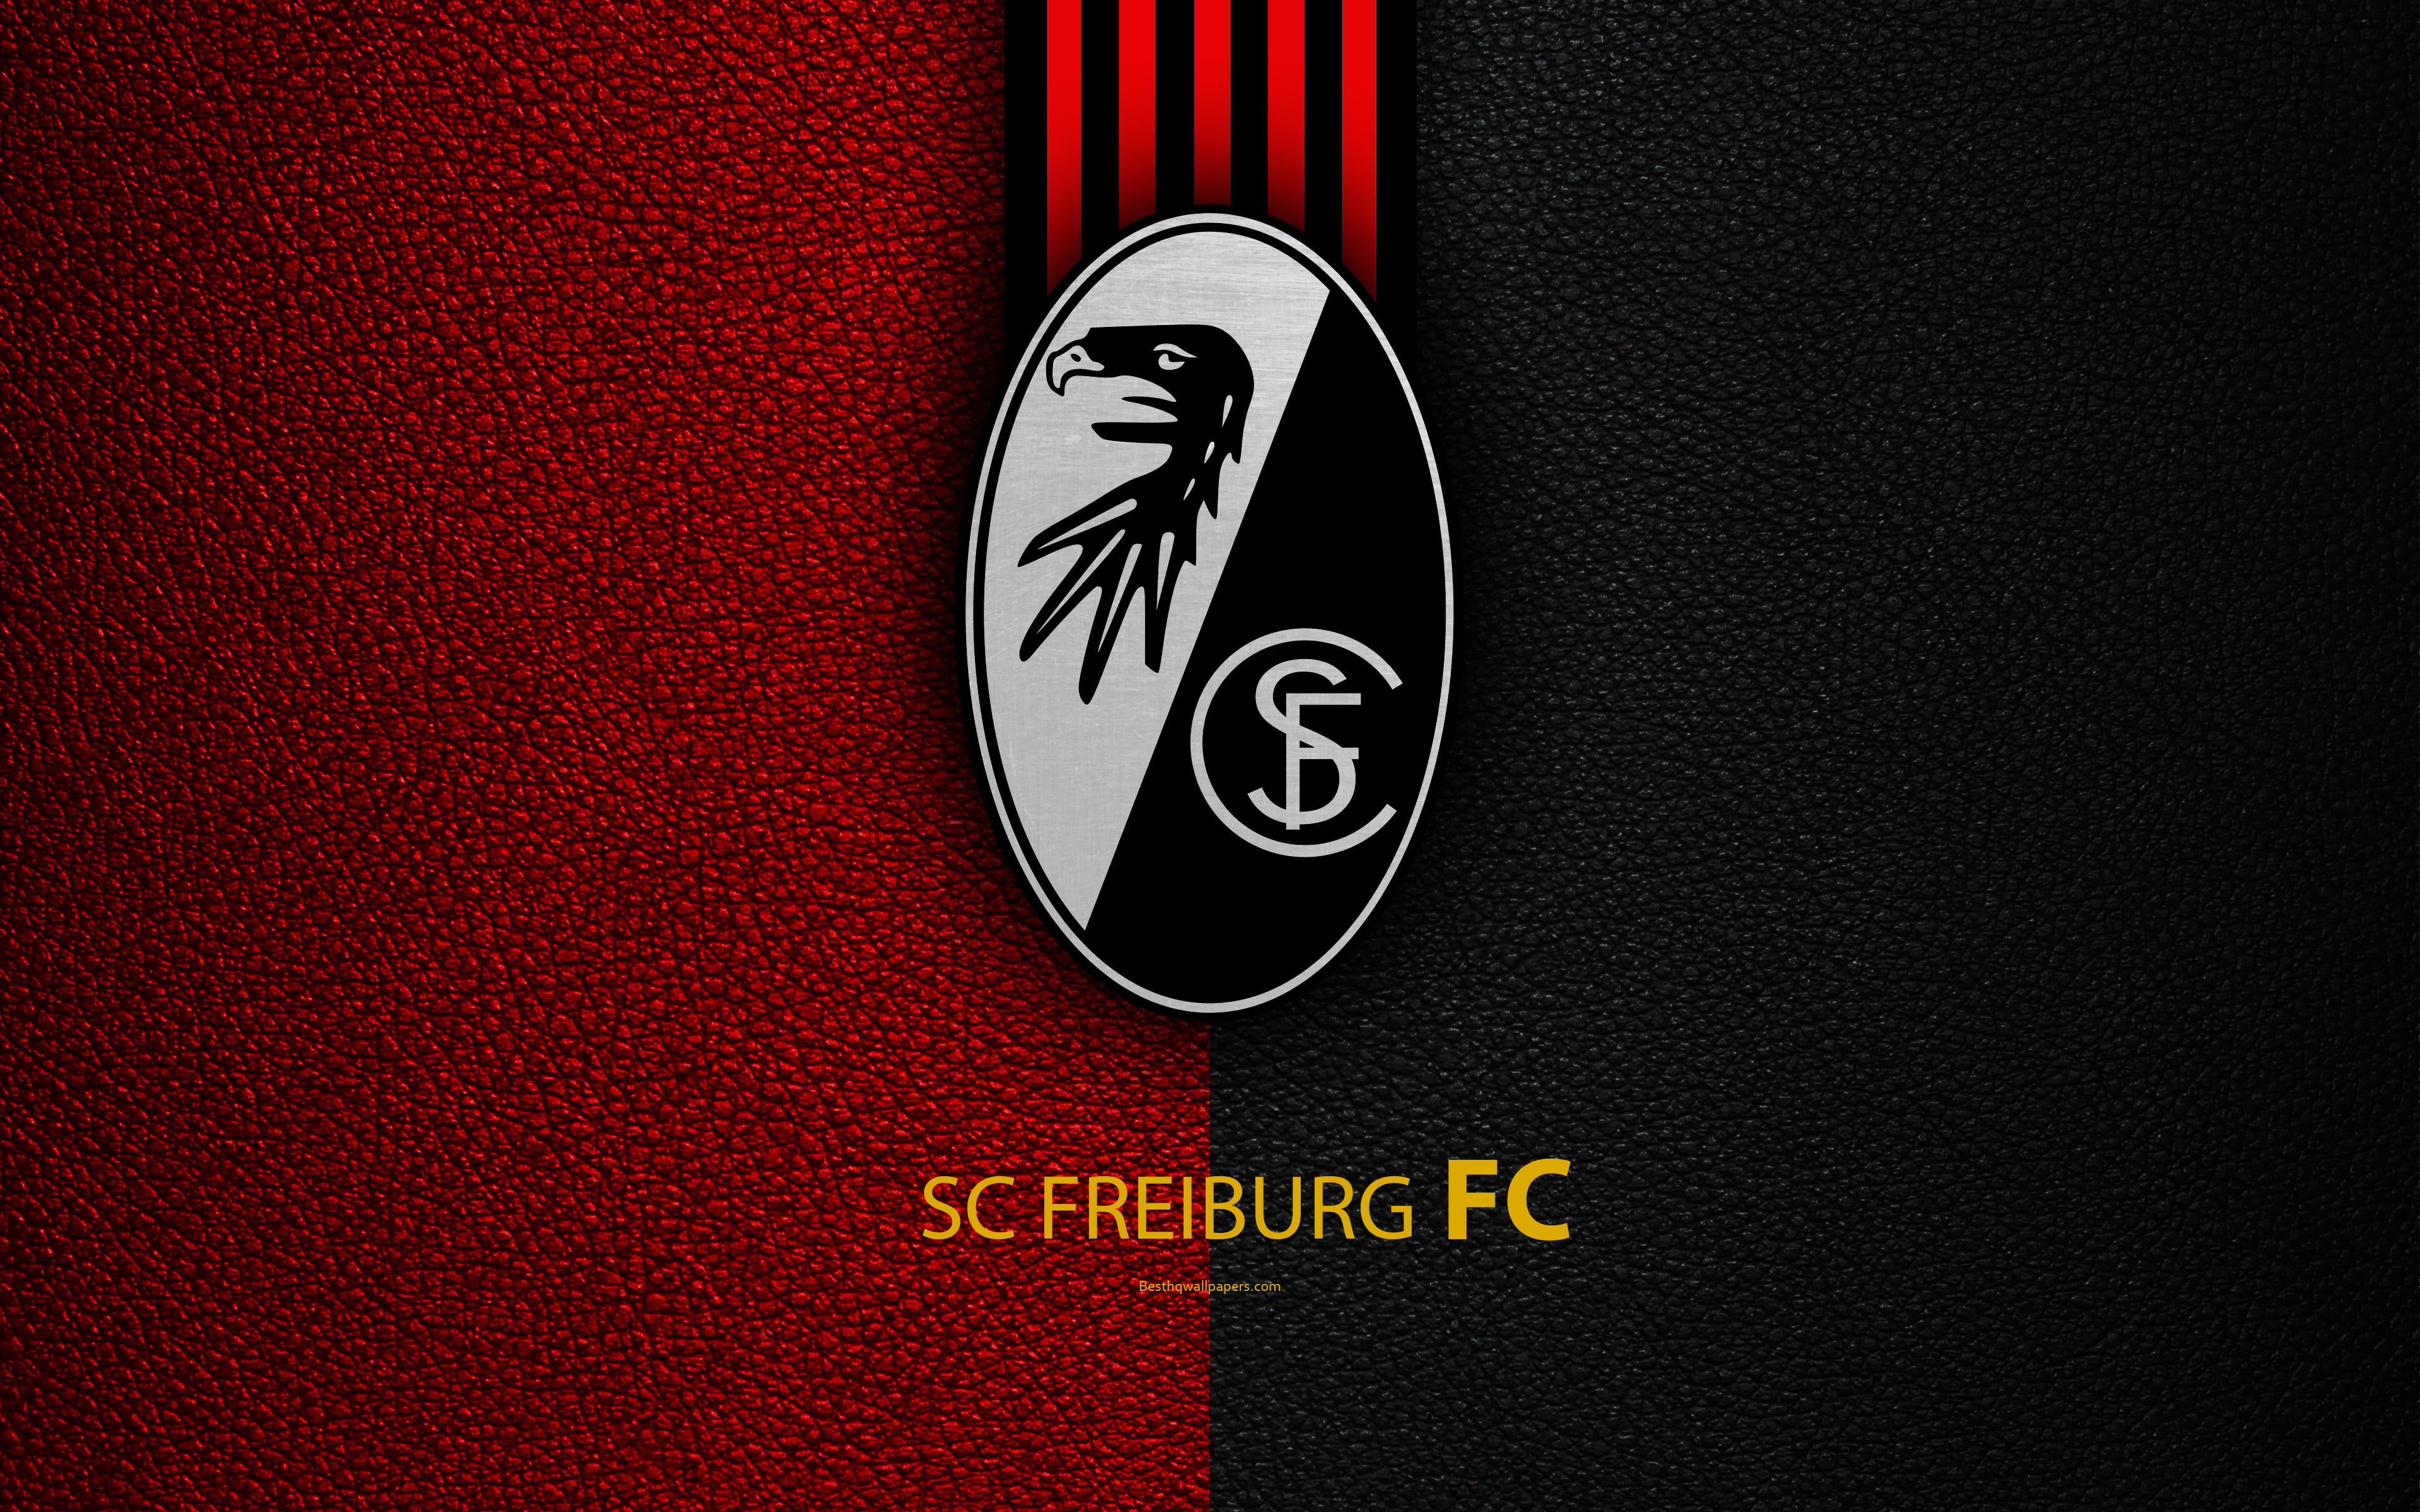 Download wallpapers SC Freiburg FC 4k German football club 3840x2400